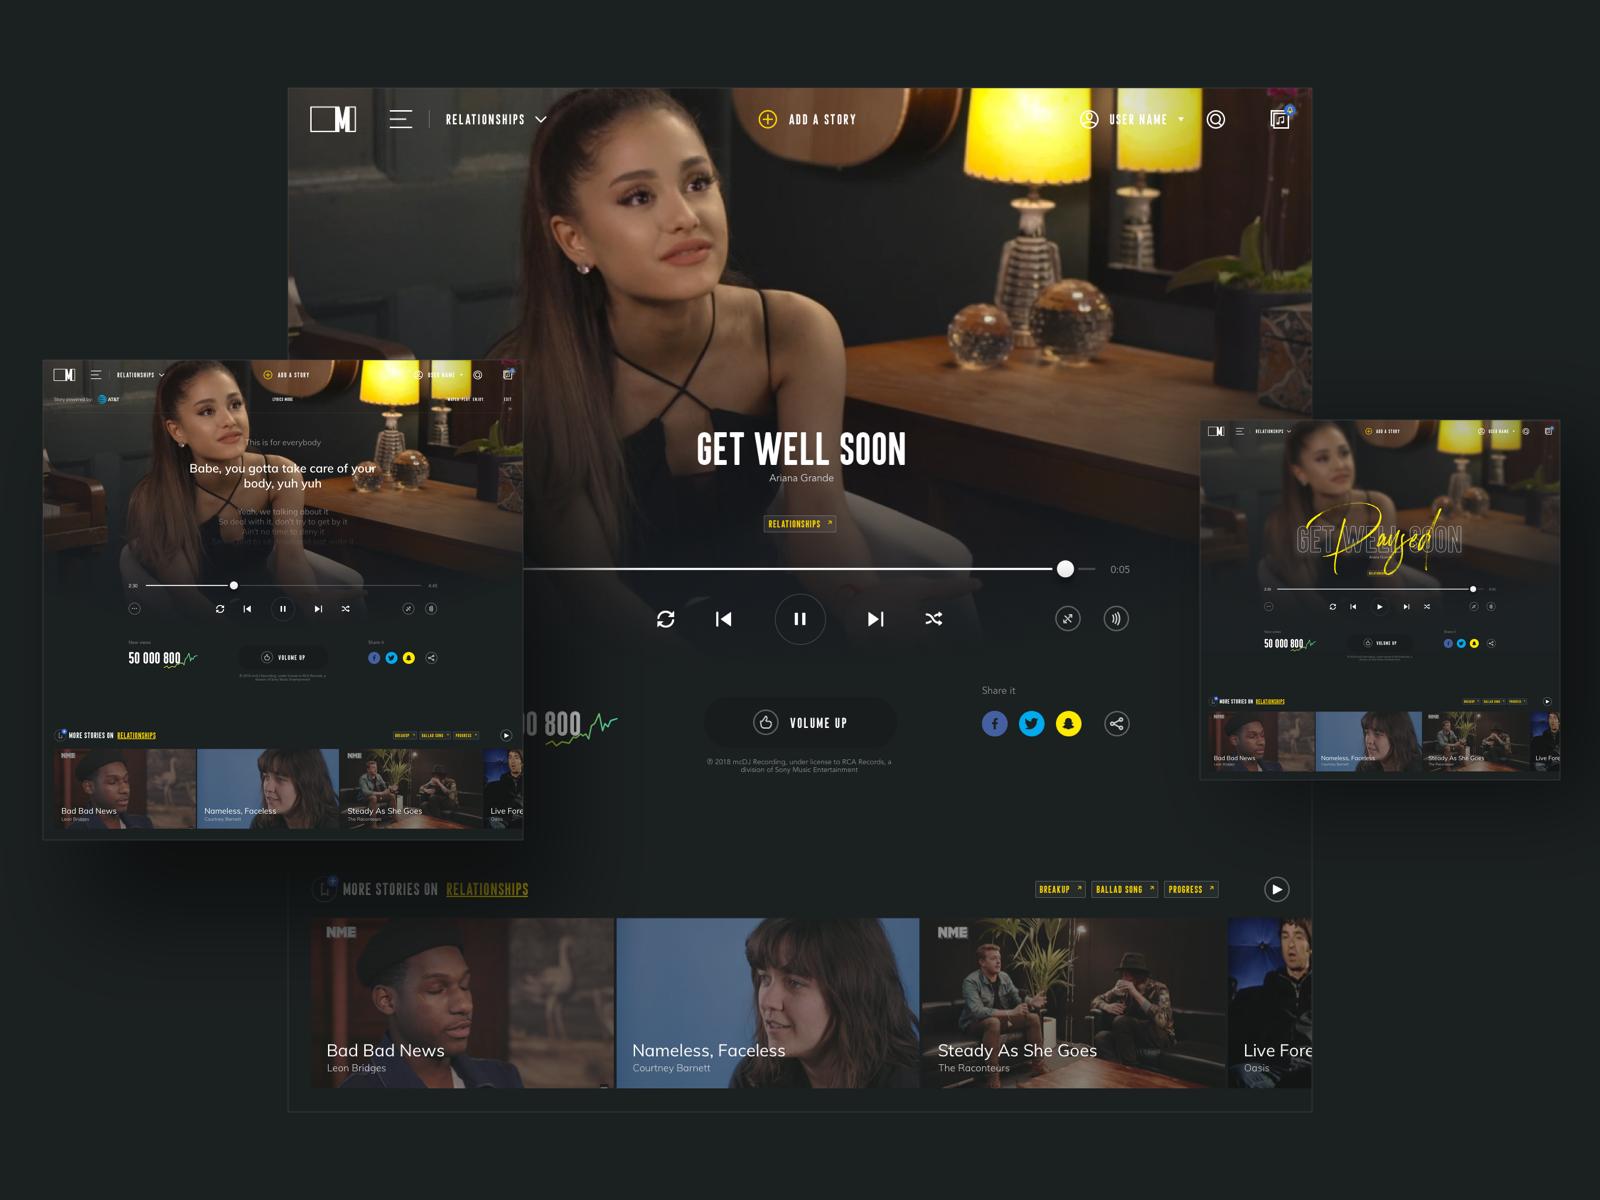 Storyshot